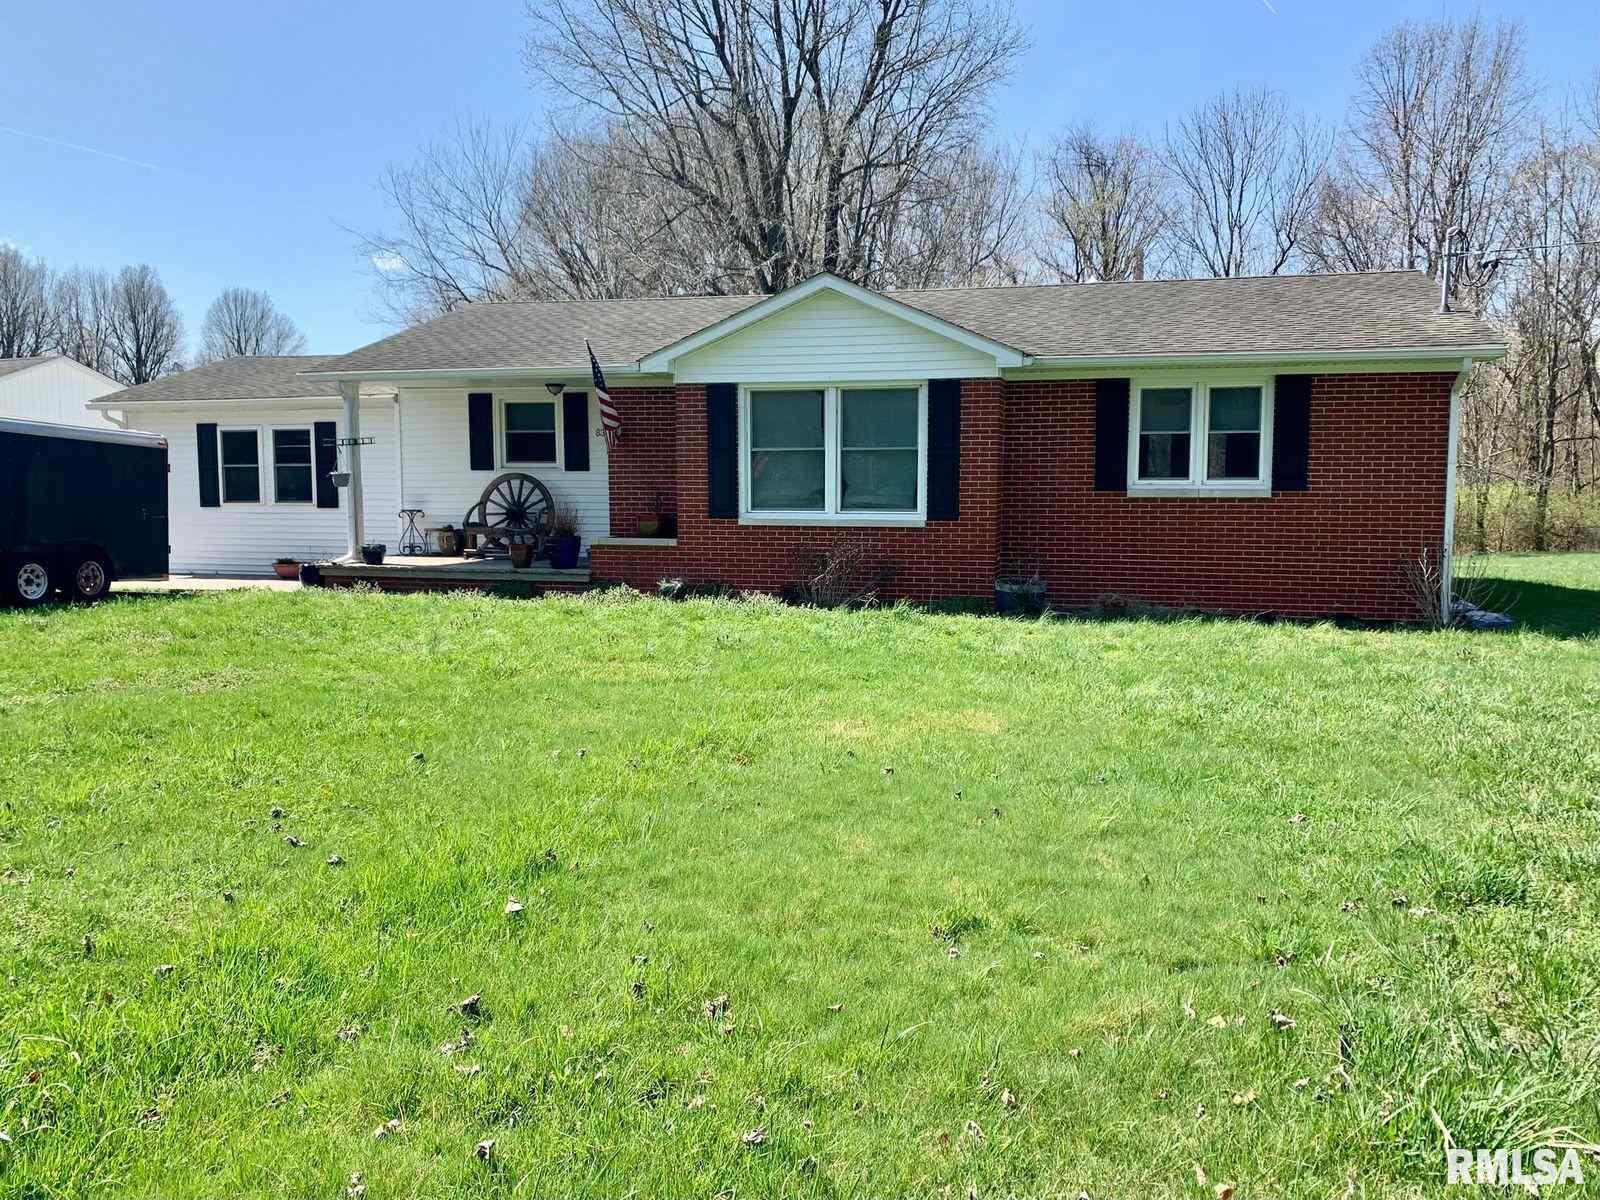 830 LOWERY Property Photo - Joppa, IL real estate listing